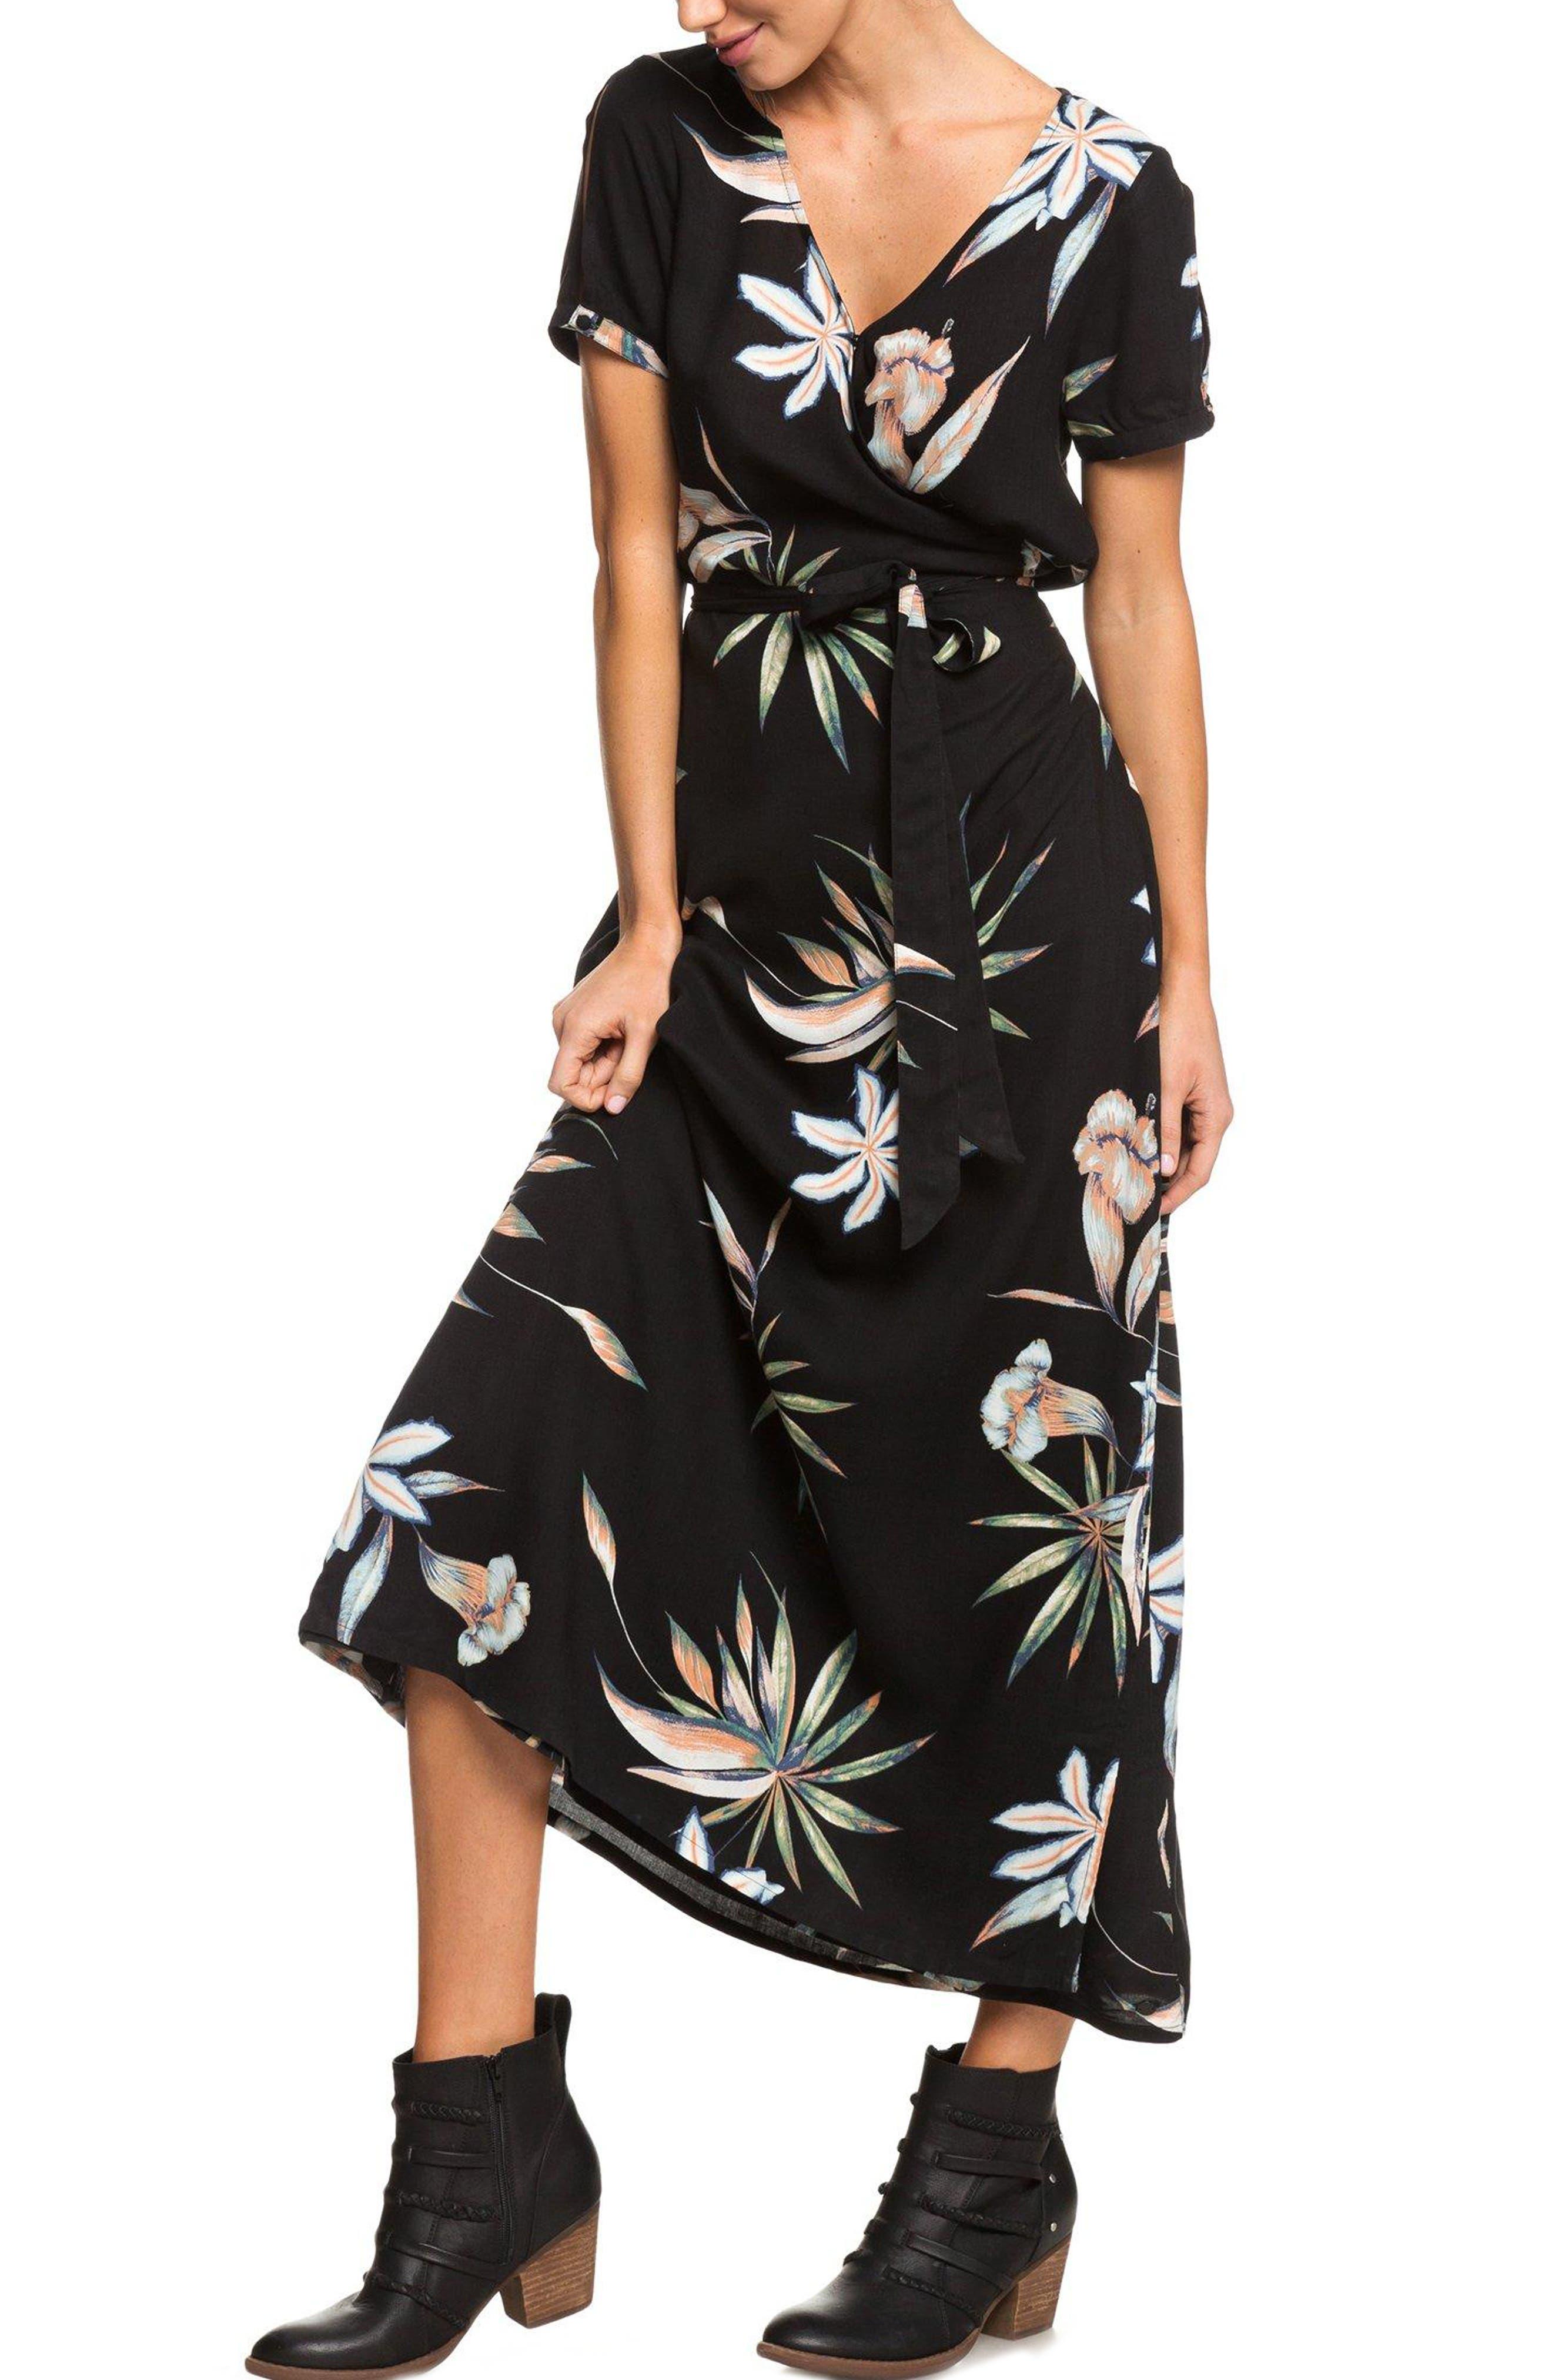 Lotus Heart Midi Dress,                         Main,                         color, TRUE BLACK NIGHTLIGHTS